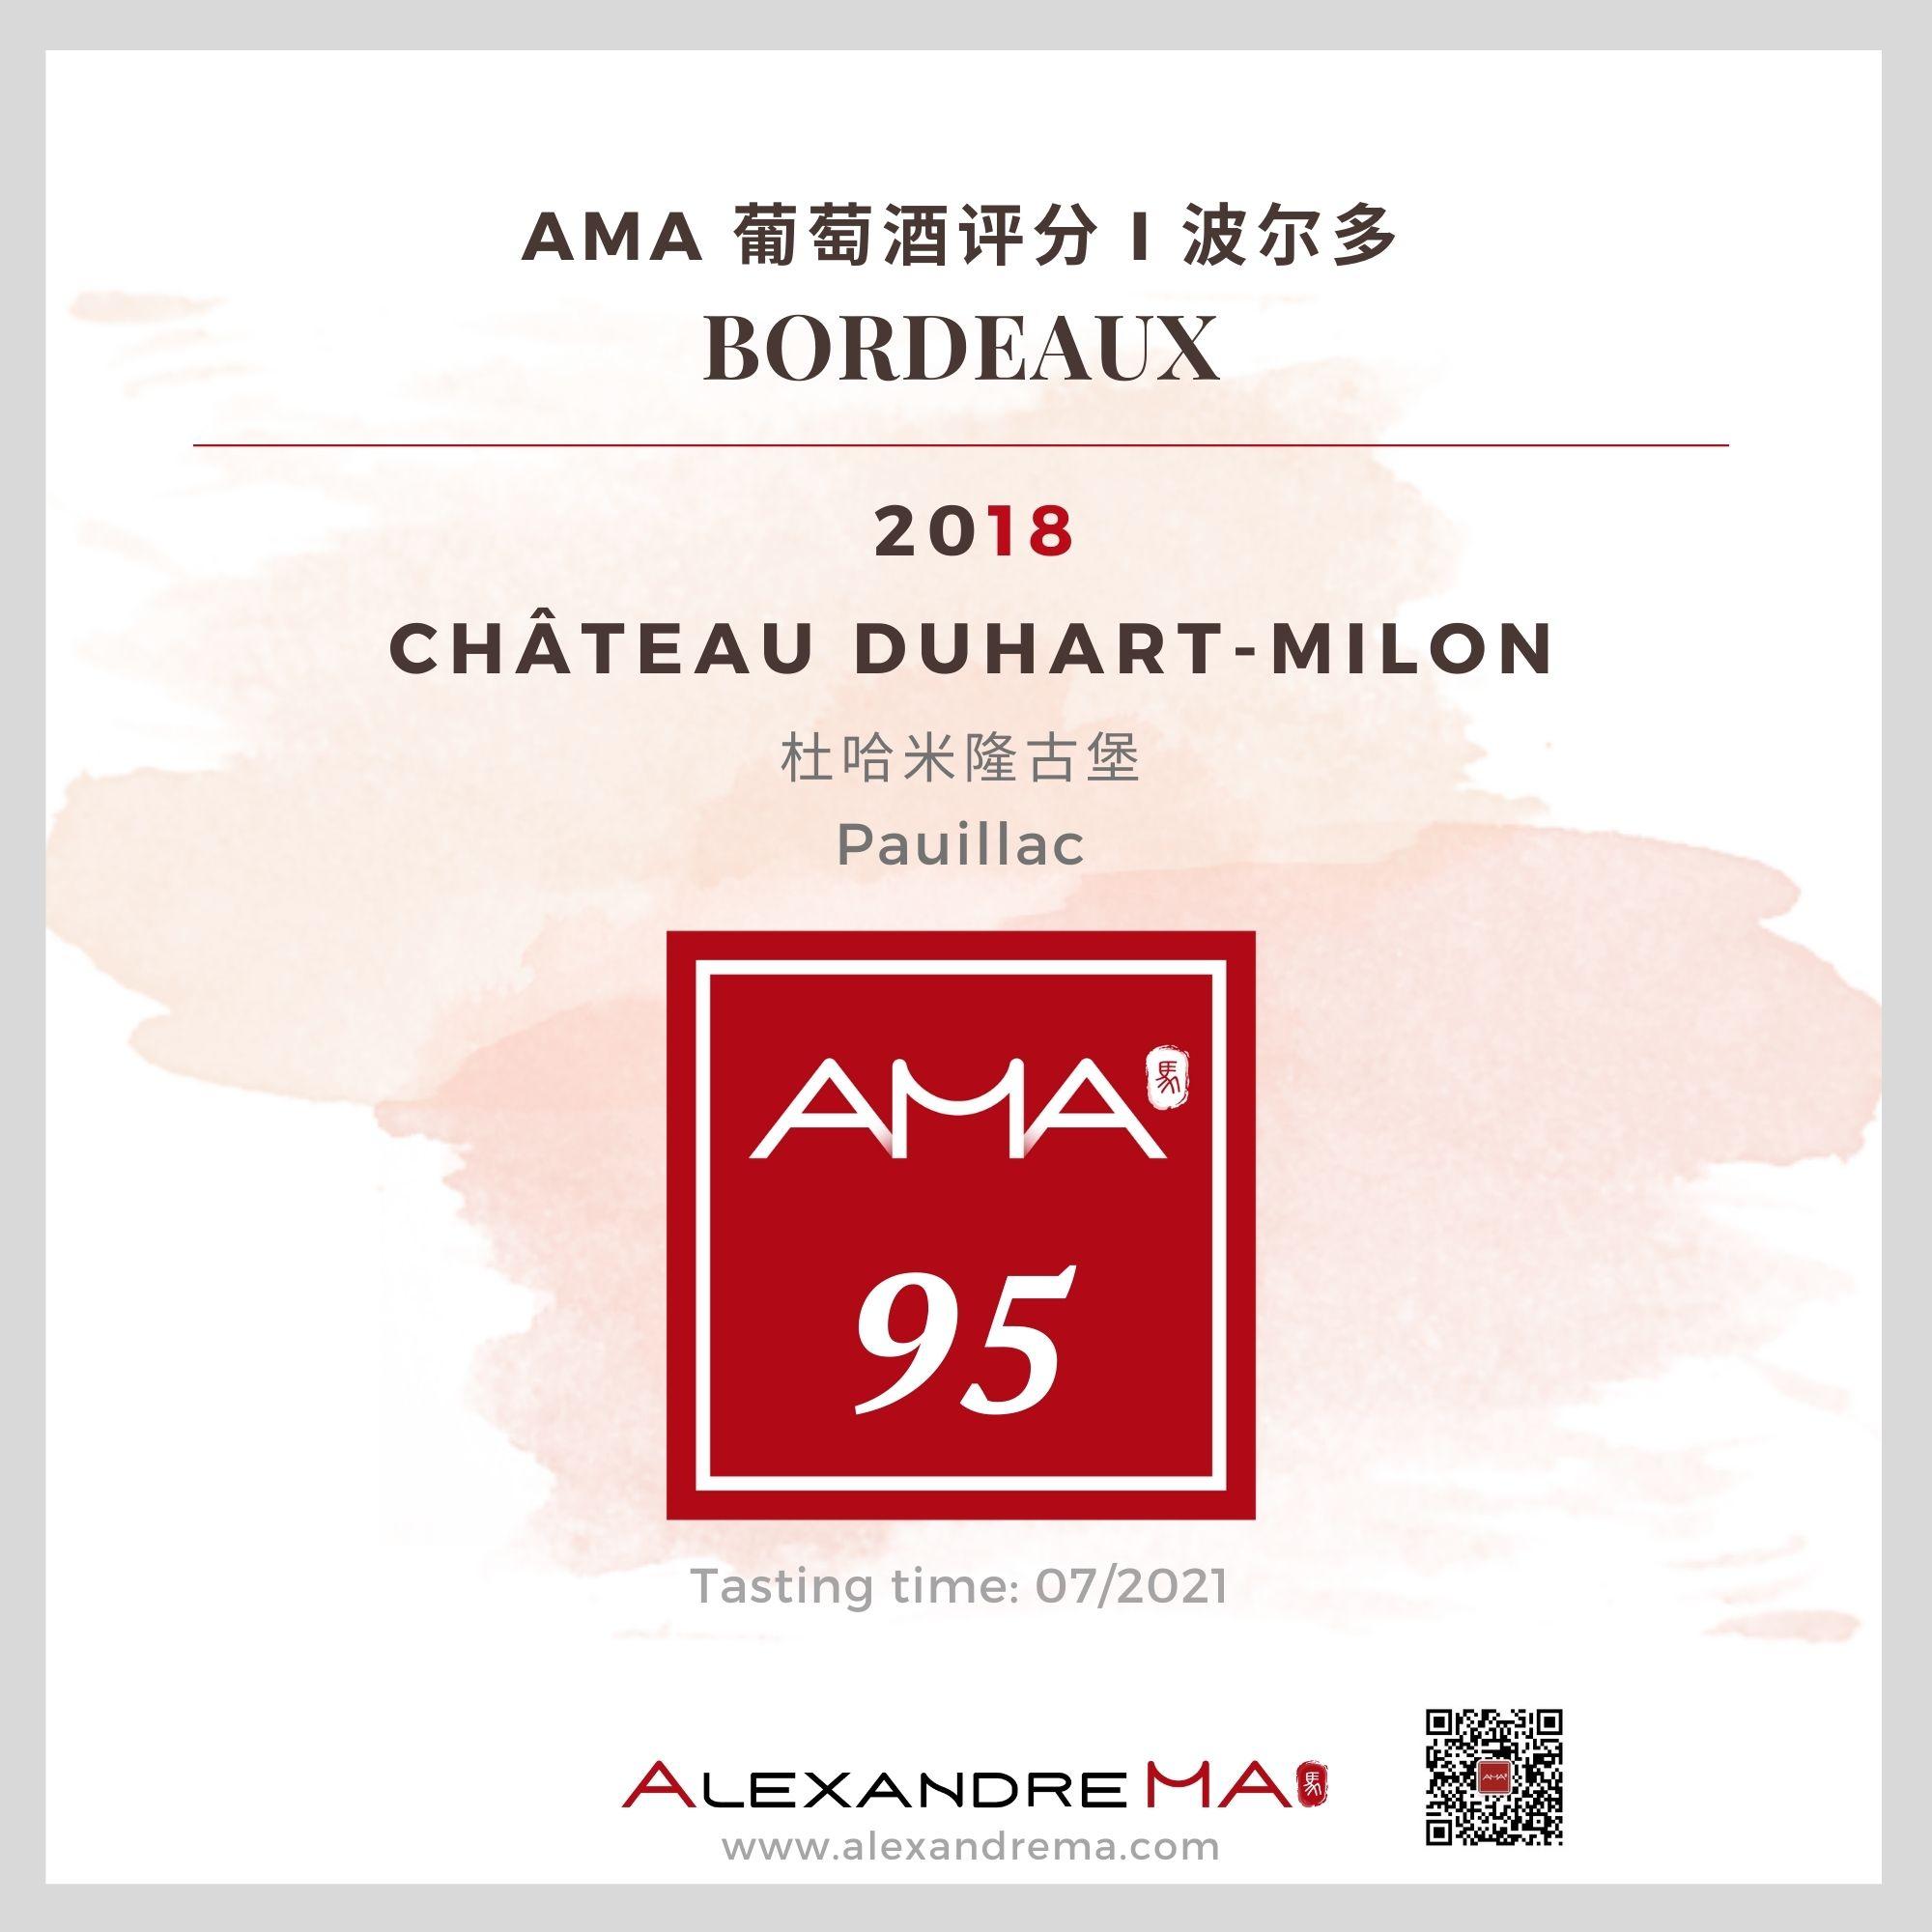 Château Duhart-Milon 2018 - Alexandre MA